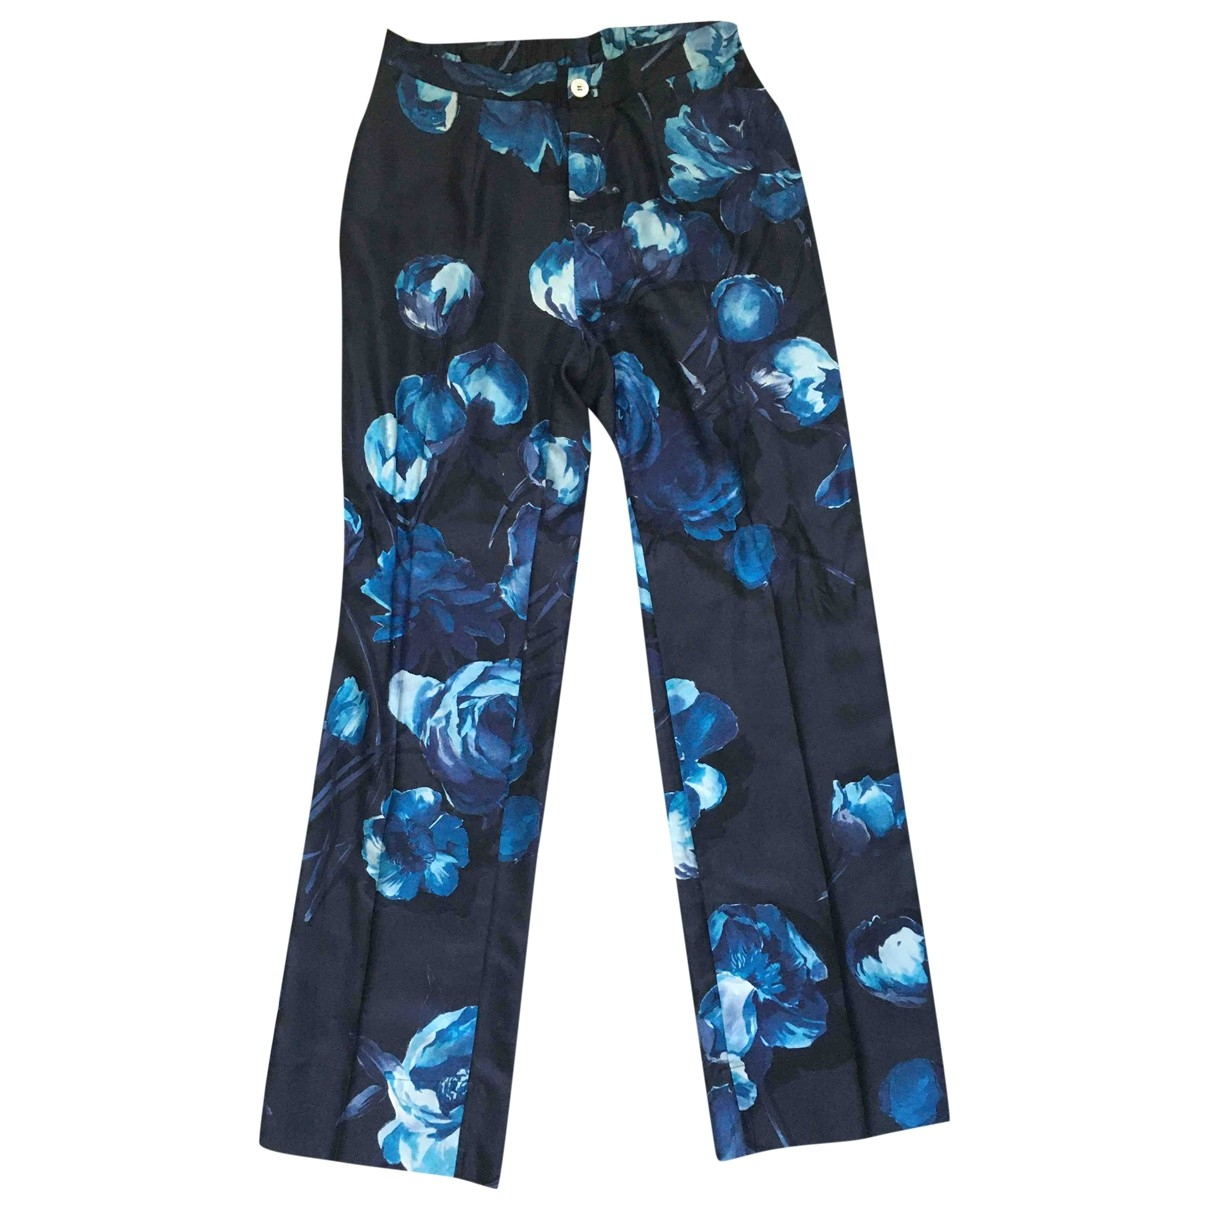 Pantalon recto de Seda F.r.s For Restless Sleepers